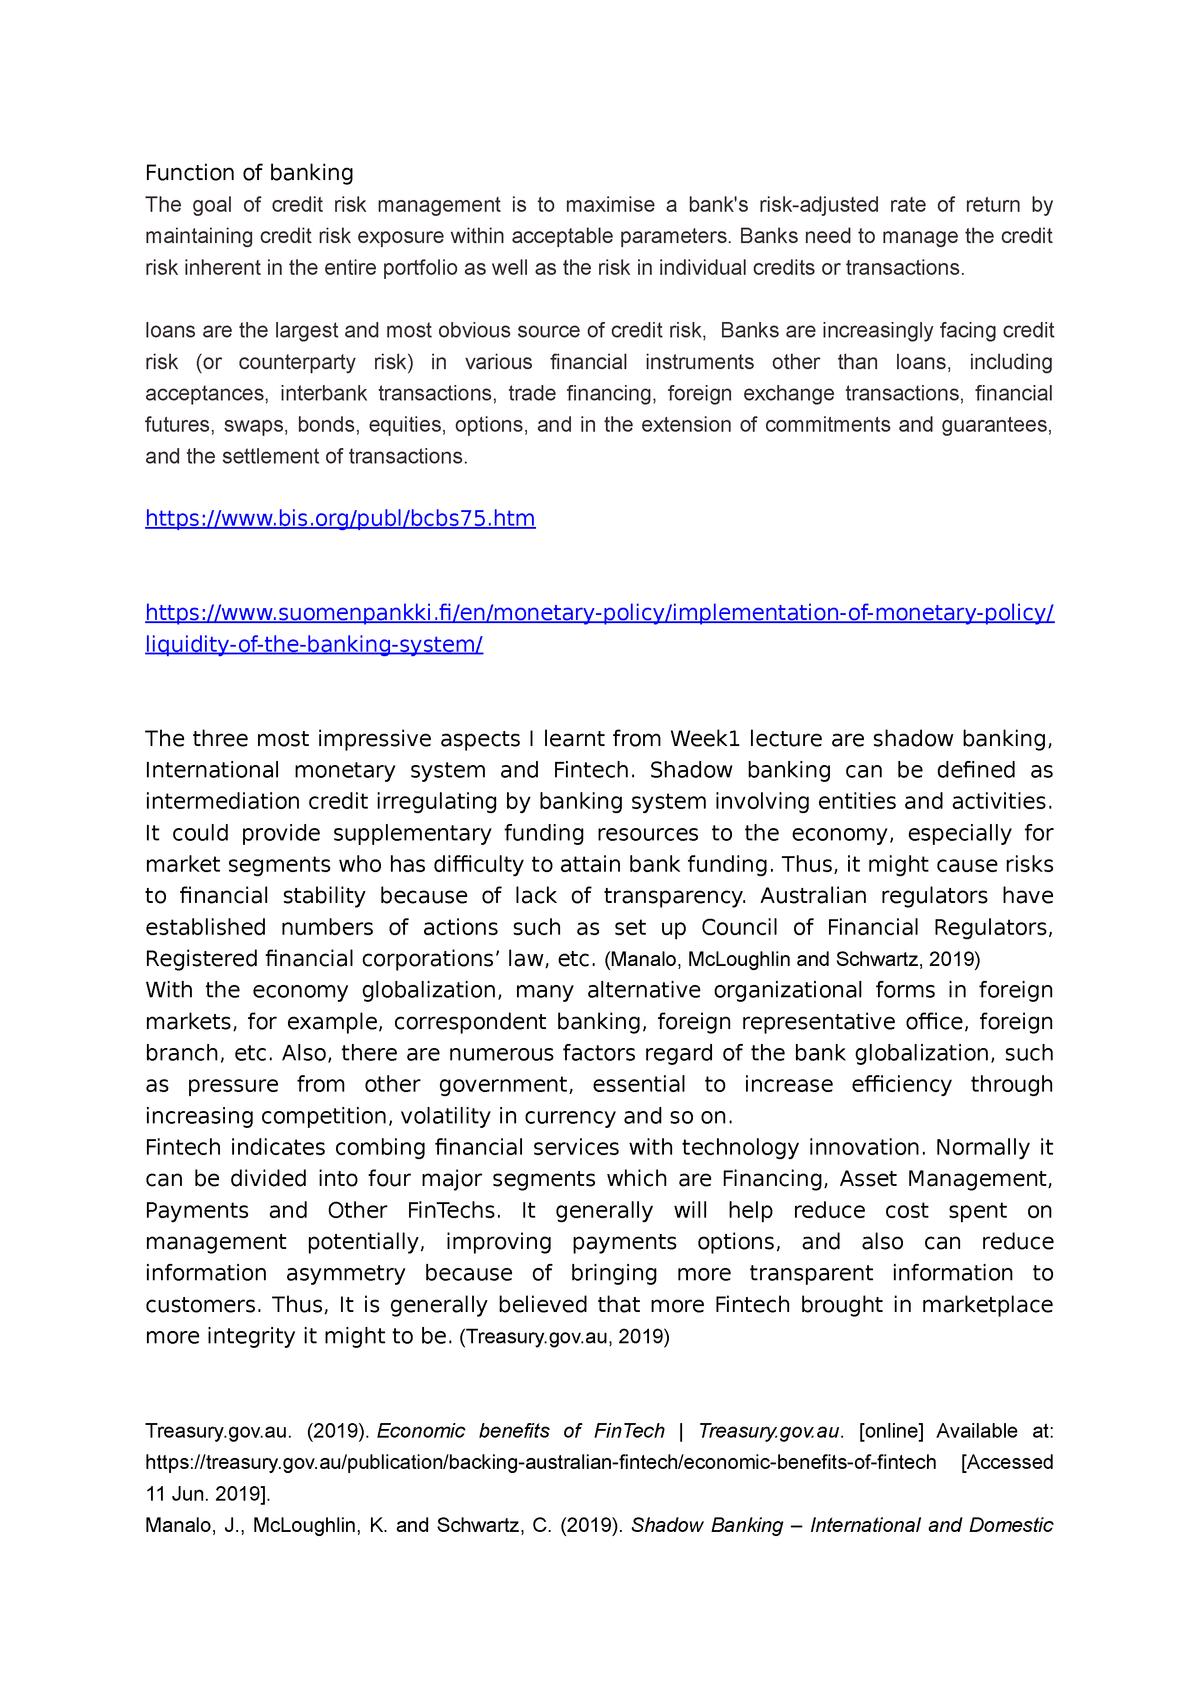 Fins3650 Reflection W1 - FINS3650: International Banking - StuDocu